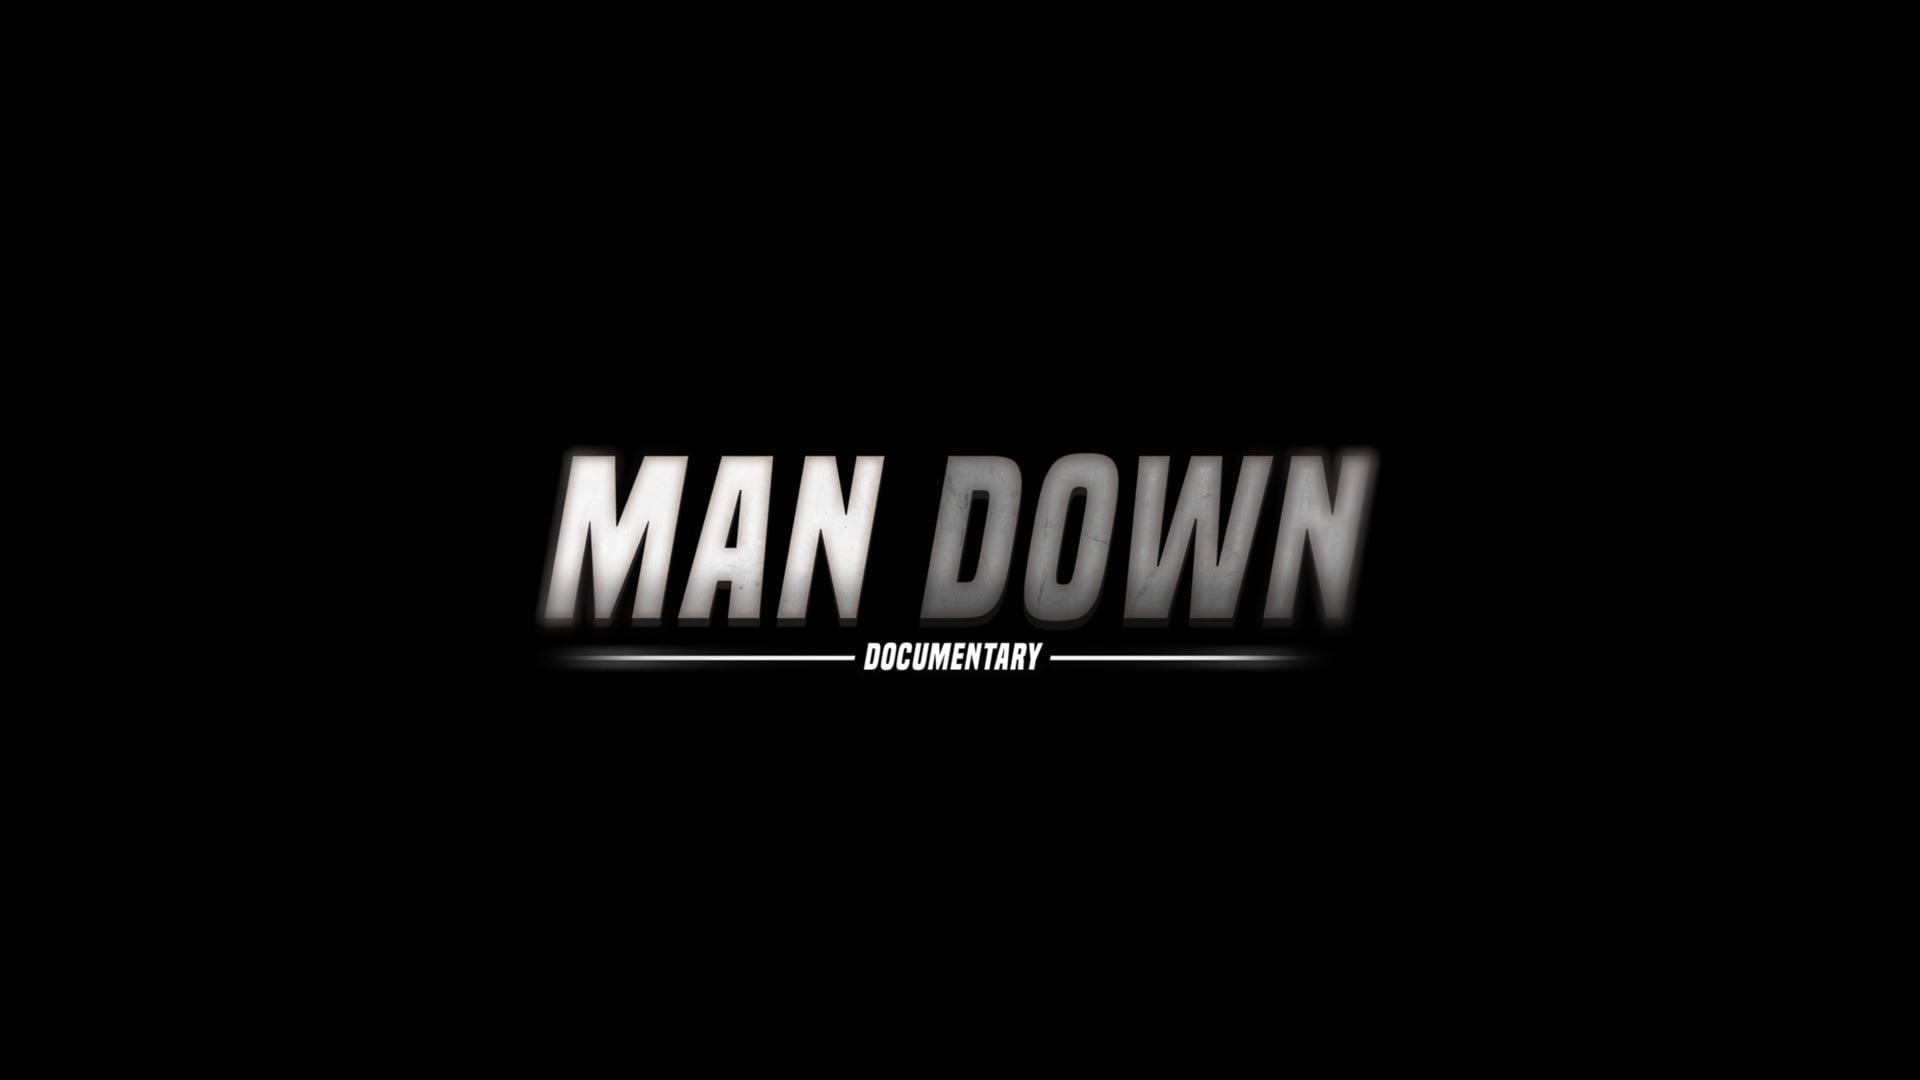 Man Down - The Documentary Trailer #2